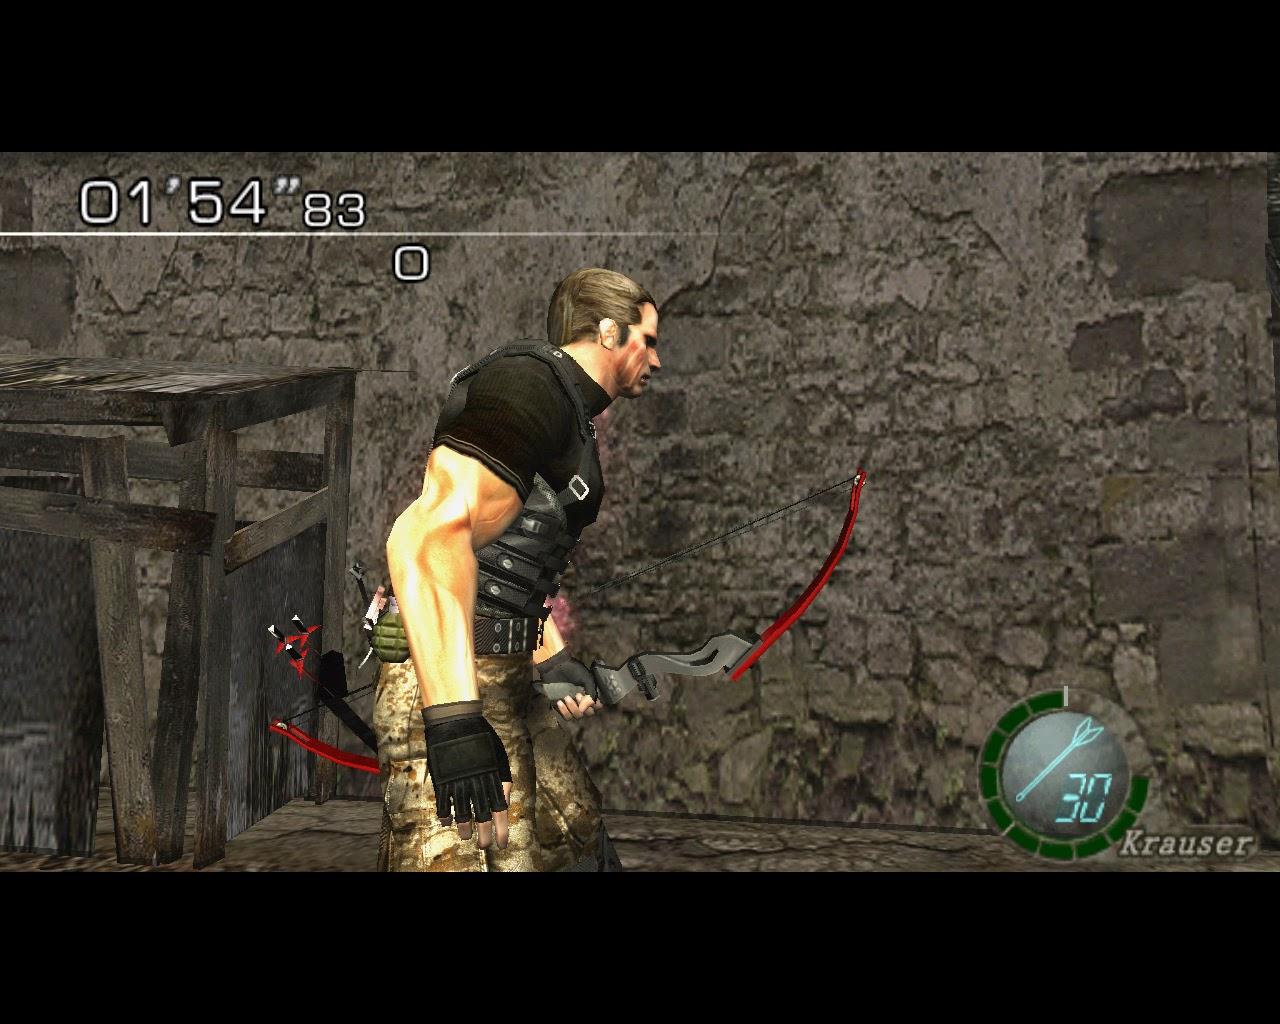 [OFFLINE] Krauser Mega HD Game%2B2015-03-08%2B17-15-55-750